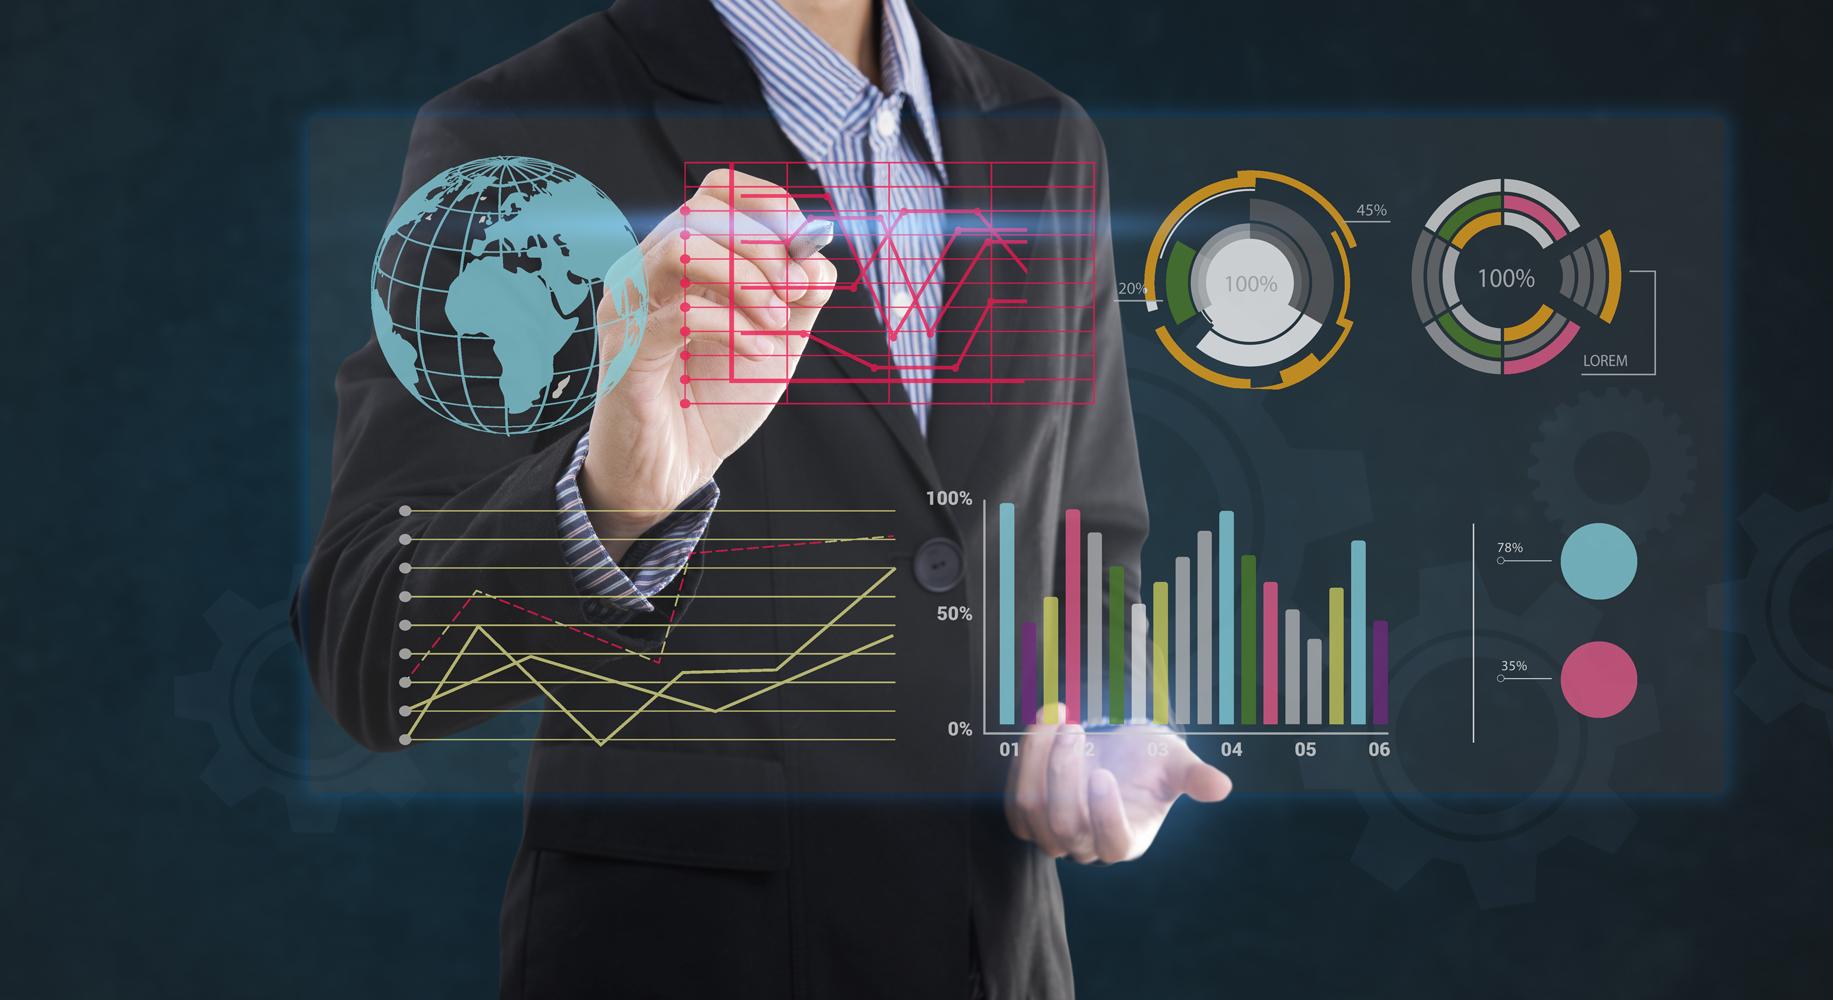 semnale ale strategiilor de tranzacționare